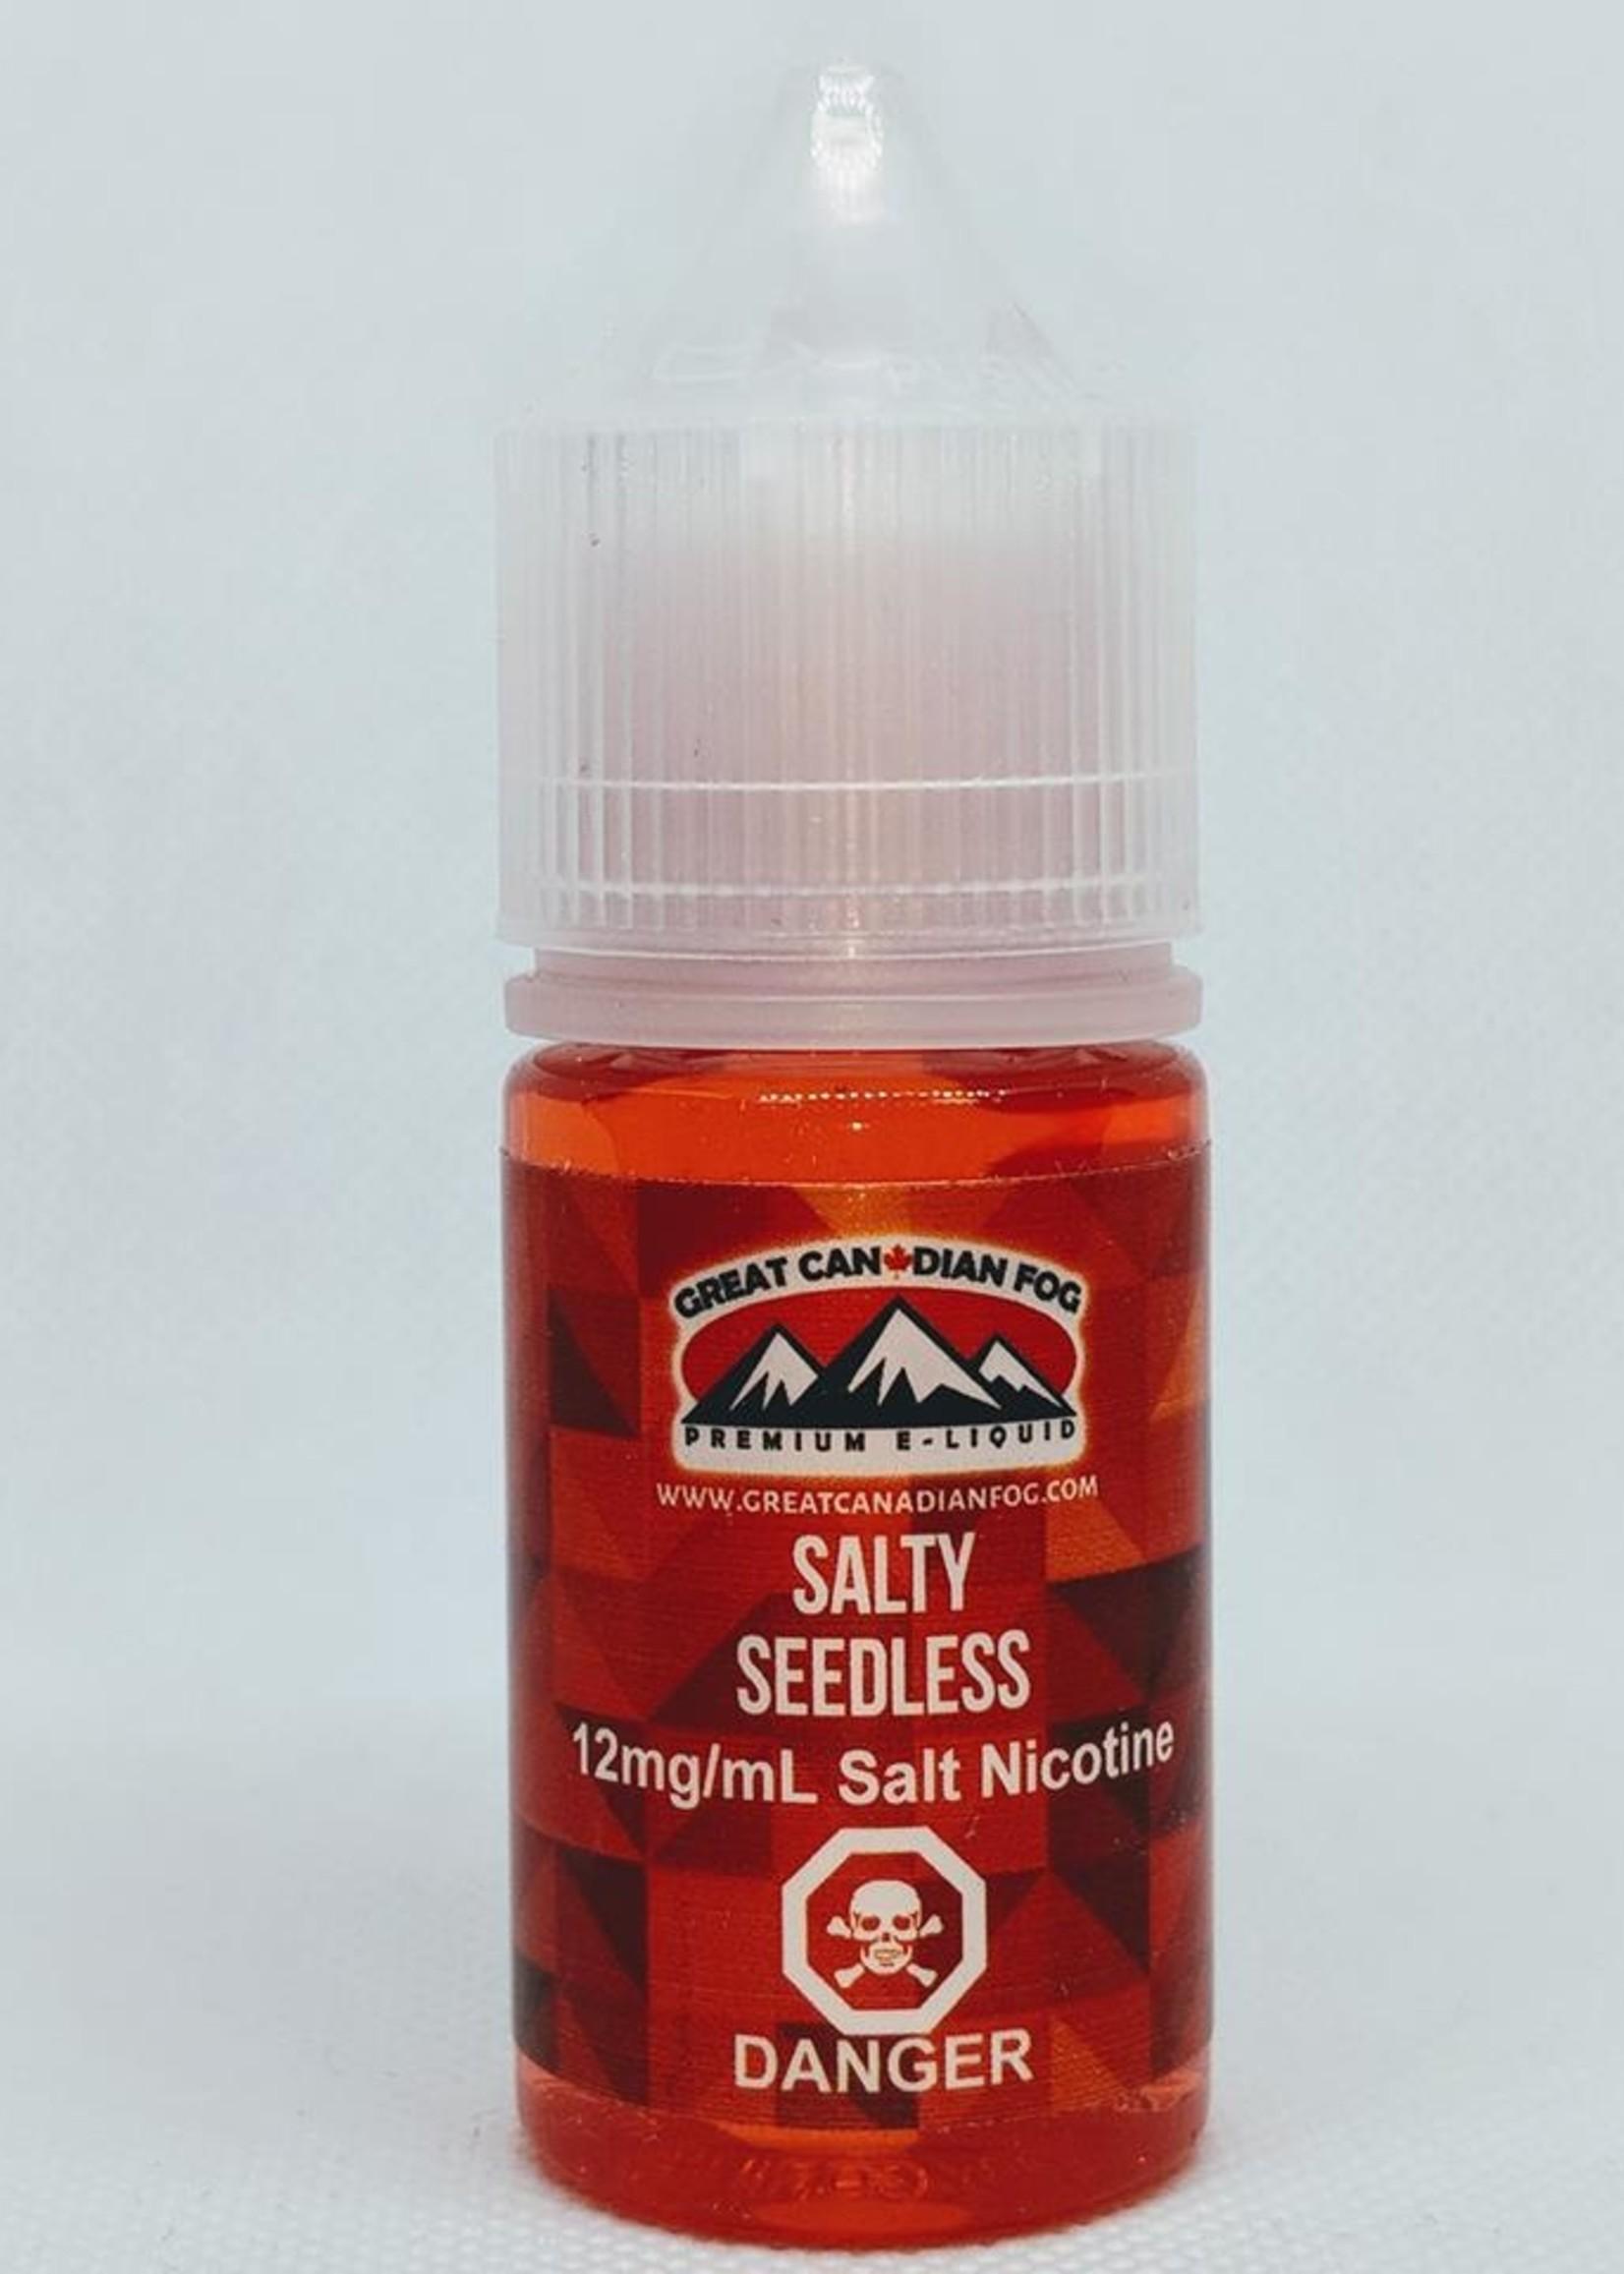 Great Canadian Fog Salty Seedless